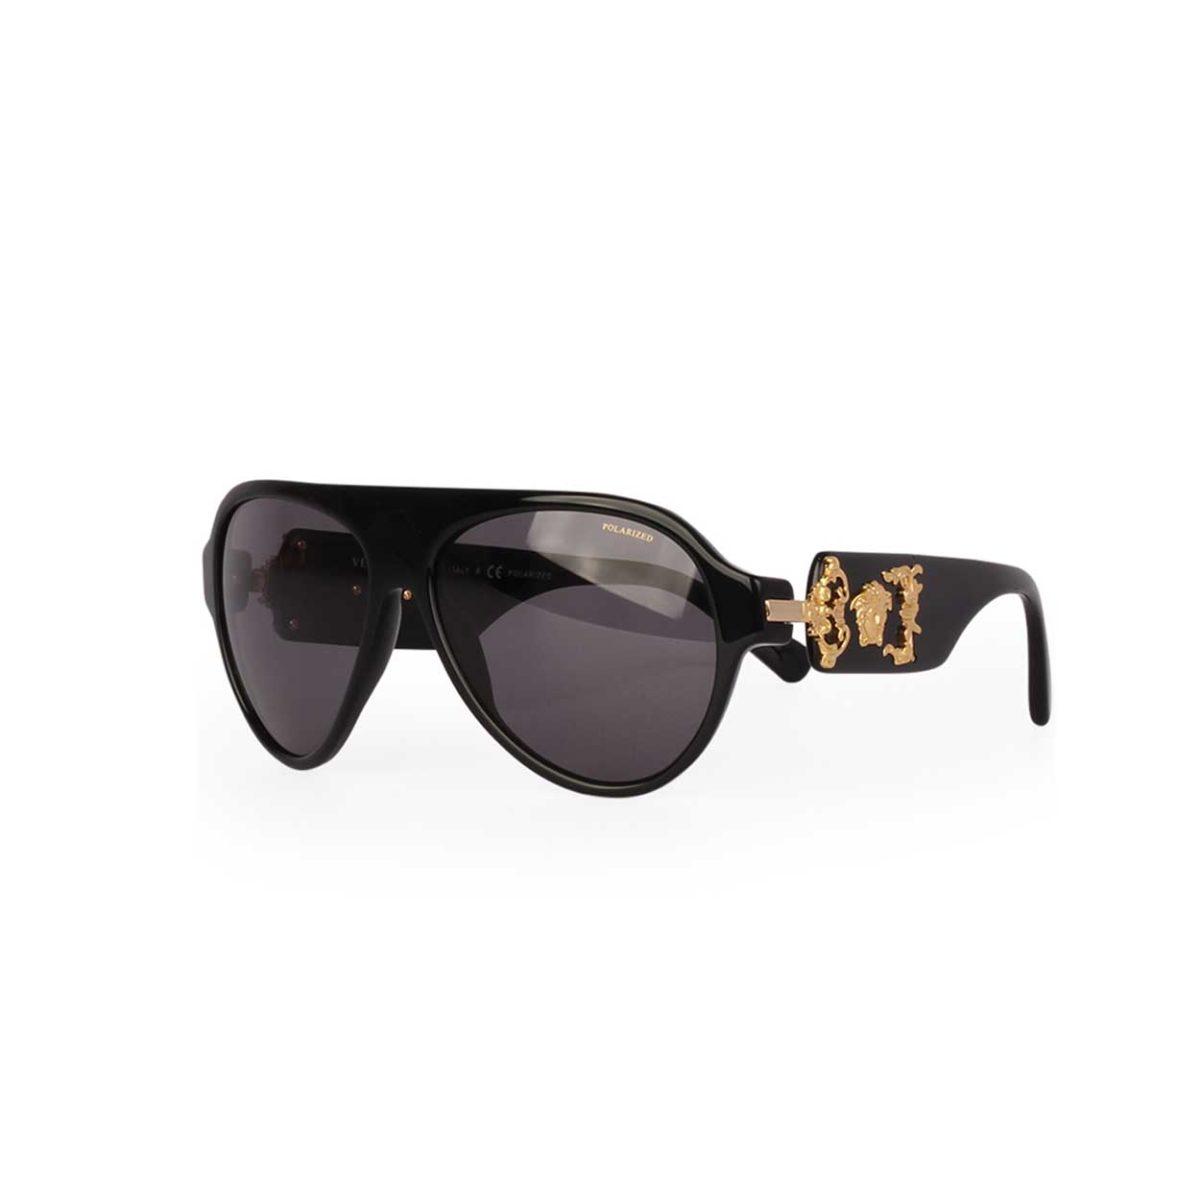 07175addc7669 VERSACE Polarized Gold Medusa Sunglasses Black 4323 GB1 81